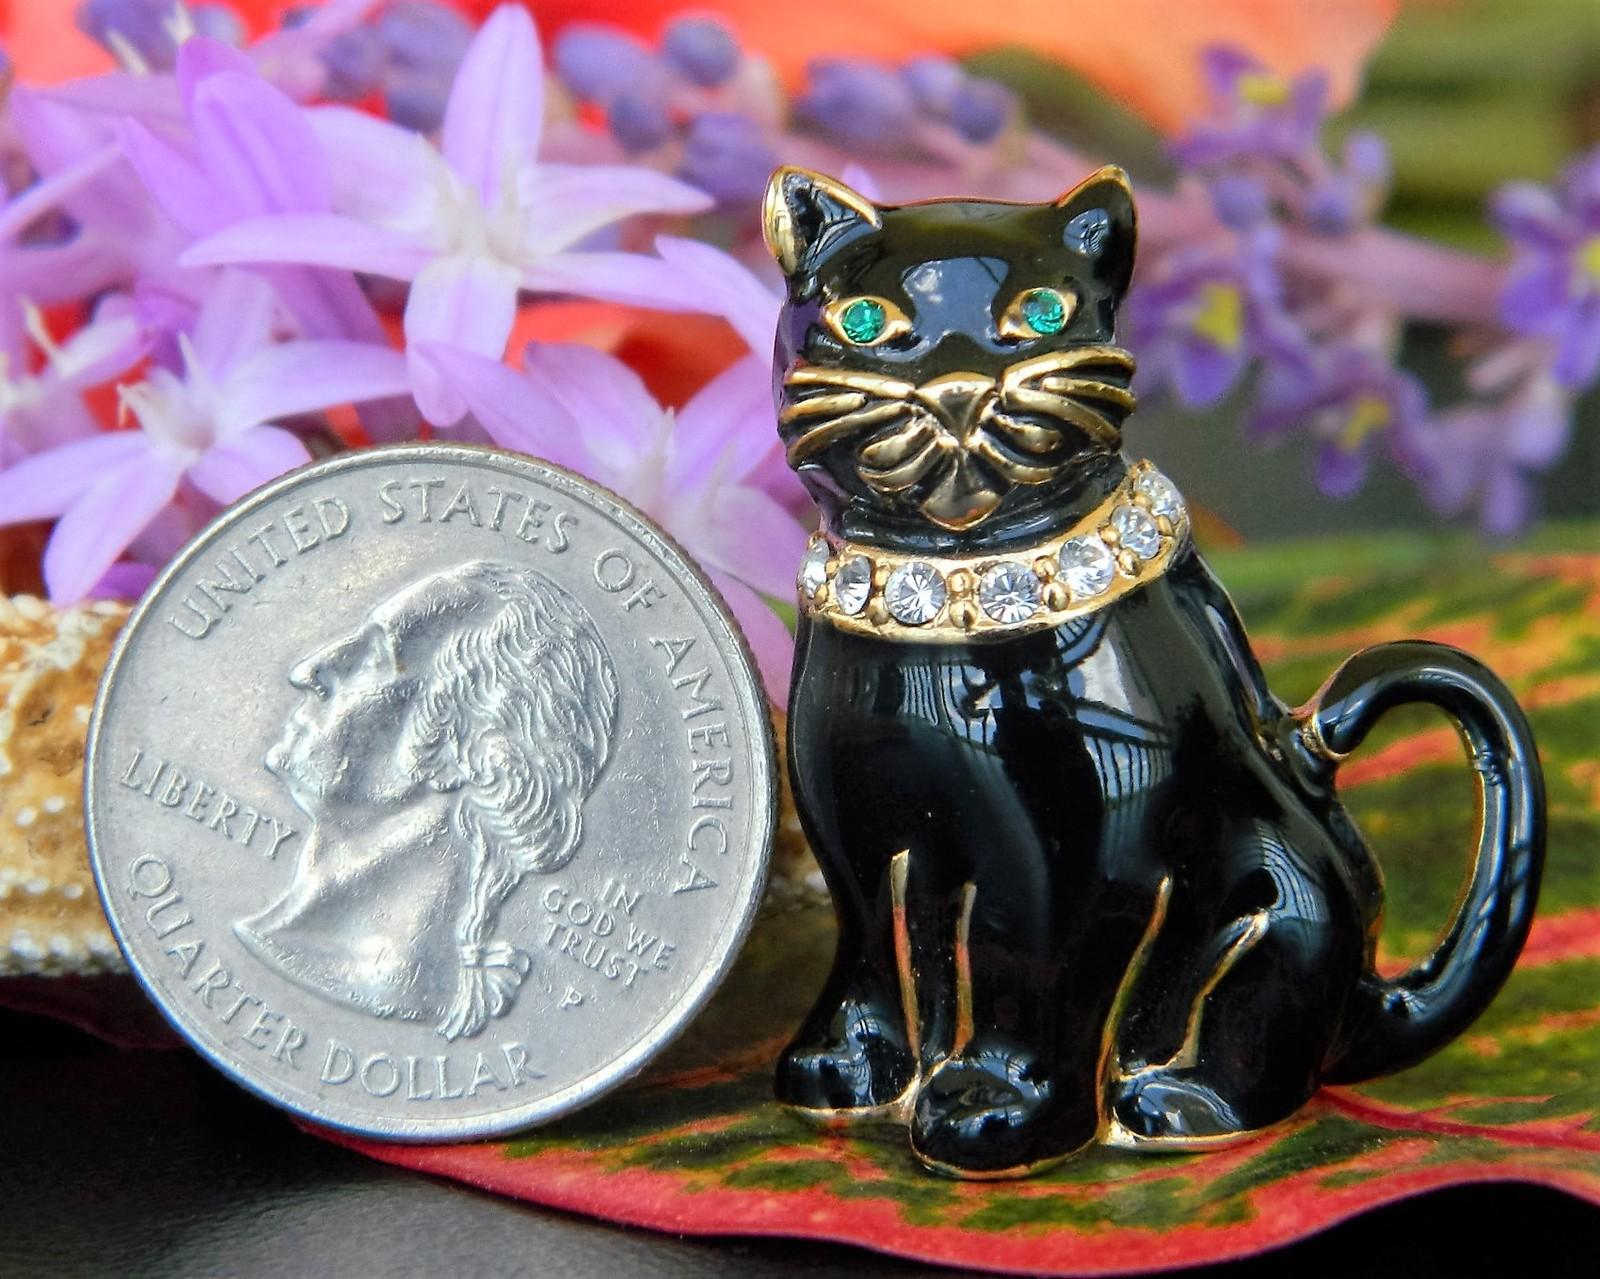 Vintage Monet Black Cat Brooch Pin Enamel Rhinestones Collar Figural image 3